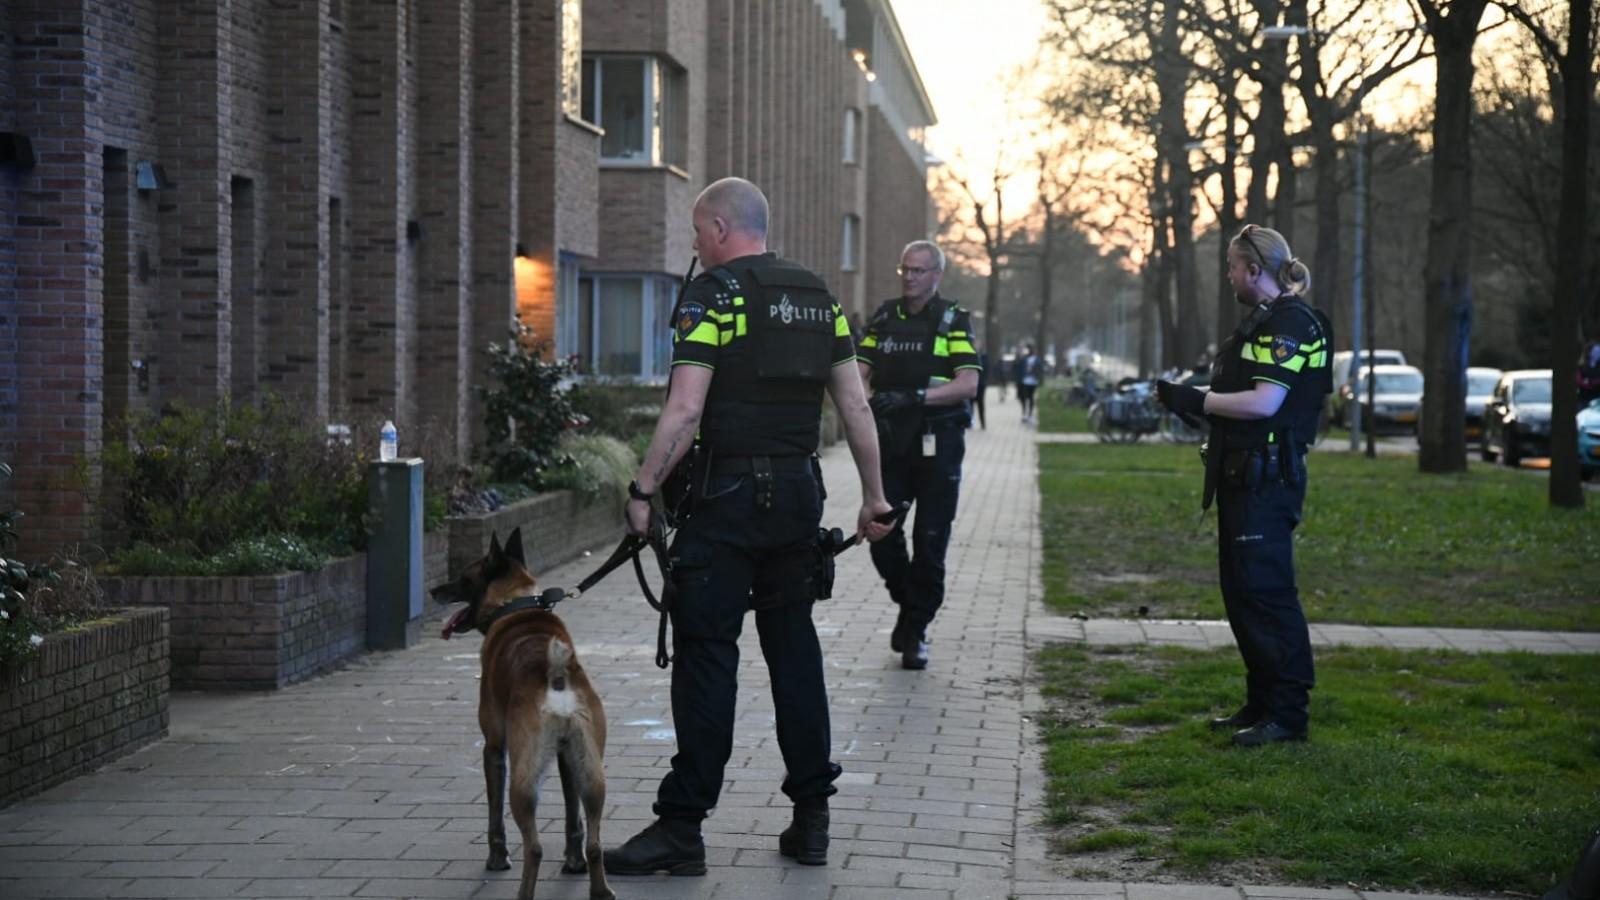 Aanhouding na steekpartij in Hilversum